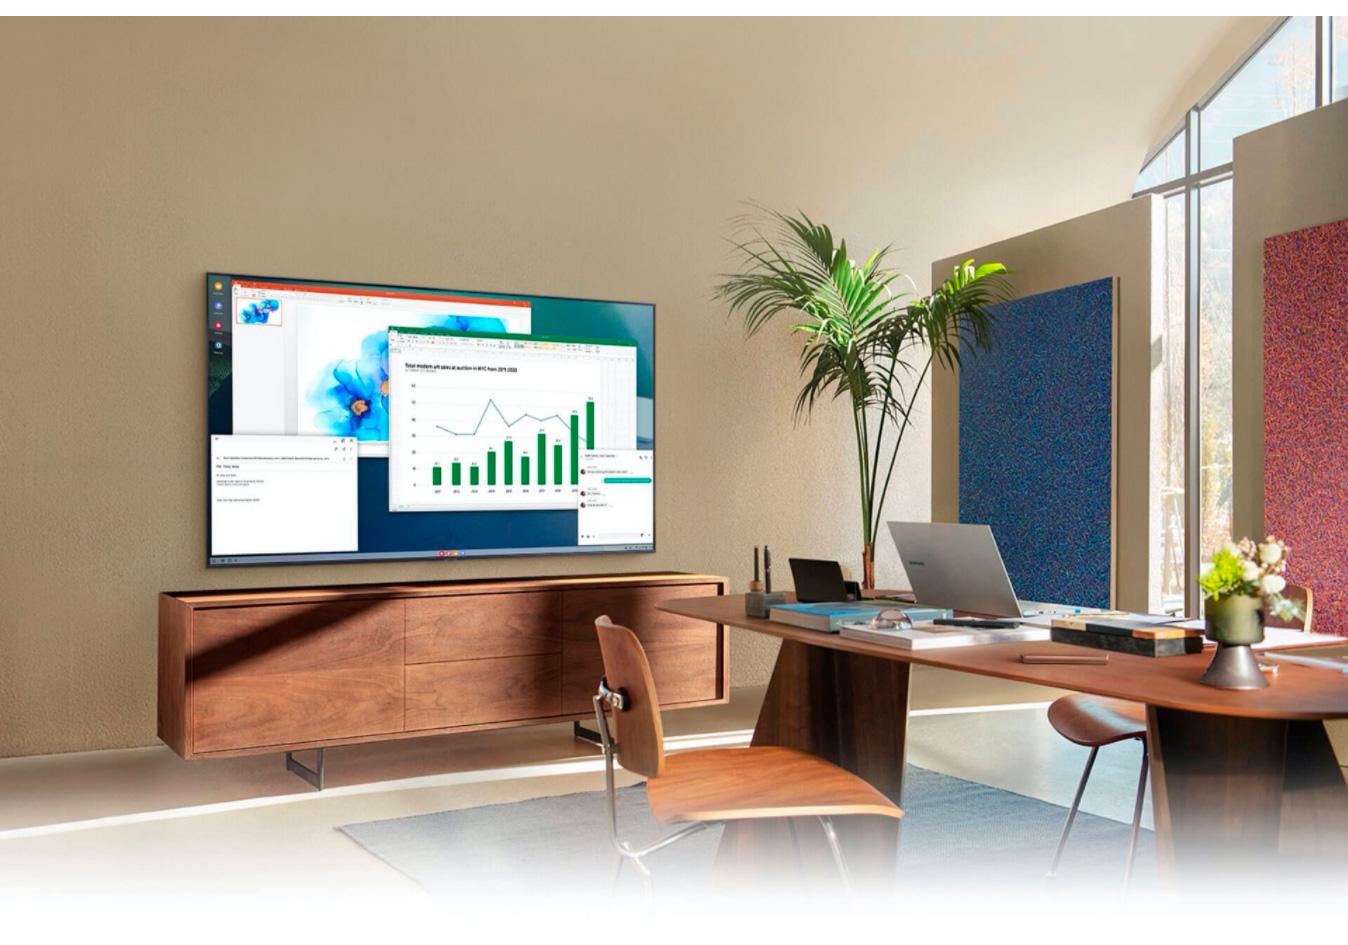 Smart TV Samsung 55 Crystal UHD 4K 55AU8000, Painel Dynamic Crystal Color, Design slim, Tela sem limites, Visual Livre de Cabos, Alexa built in, Controle Único